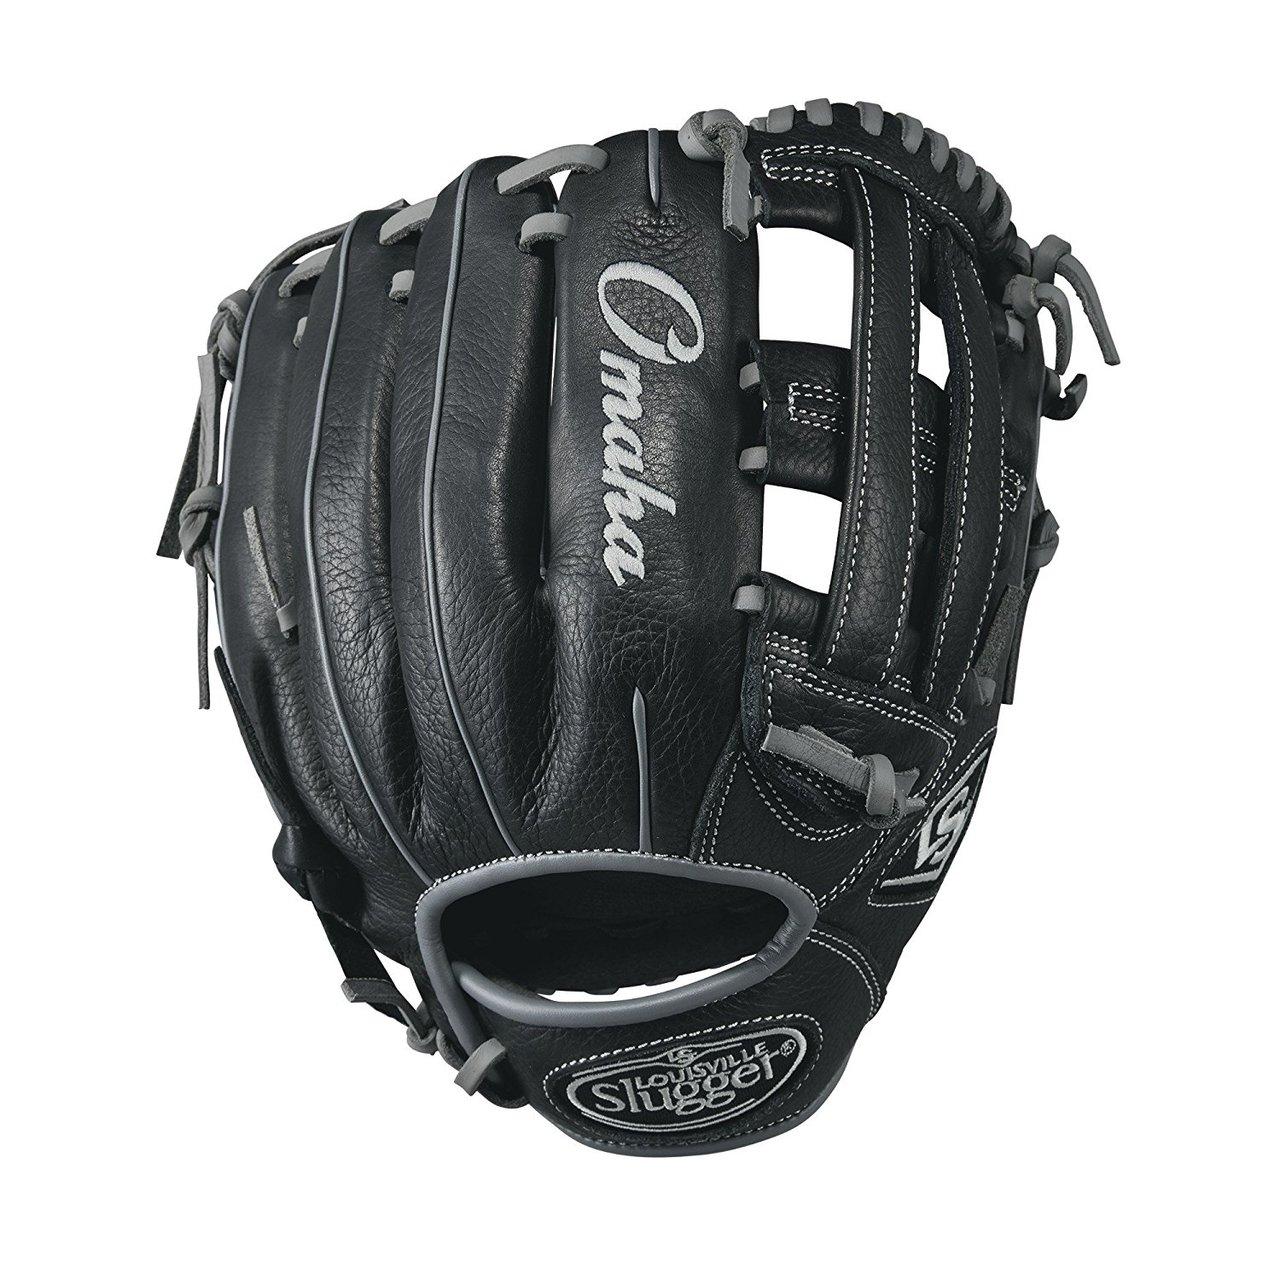 louisville-slugger-omaha-11-5-inch-wtlomrb17115-baseball-glove-right-hand-throw LOMRB17115-RightHandThrow Louisville 887768498542 11.5 infield WTLOMRB17115 Dual post web pattern Soft full-grain Steerhide leather